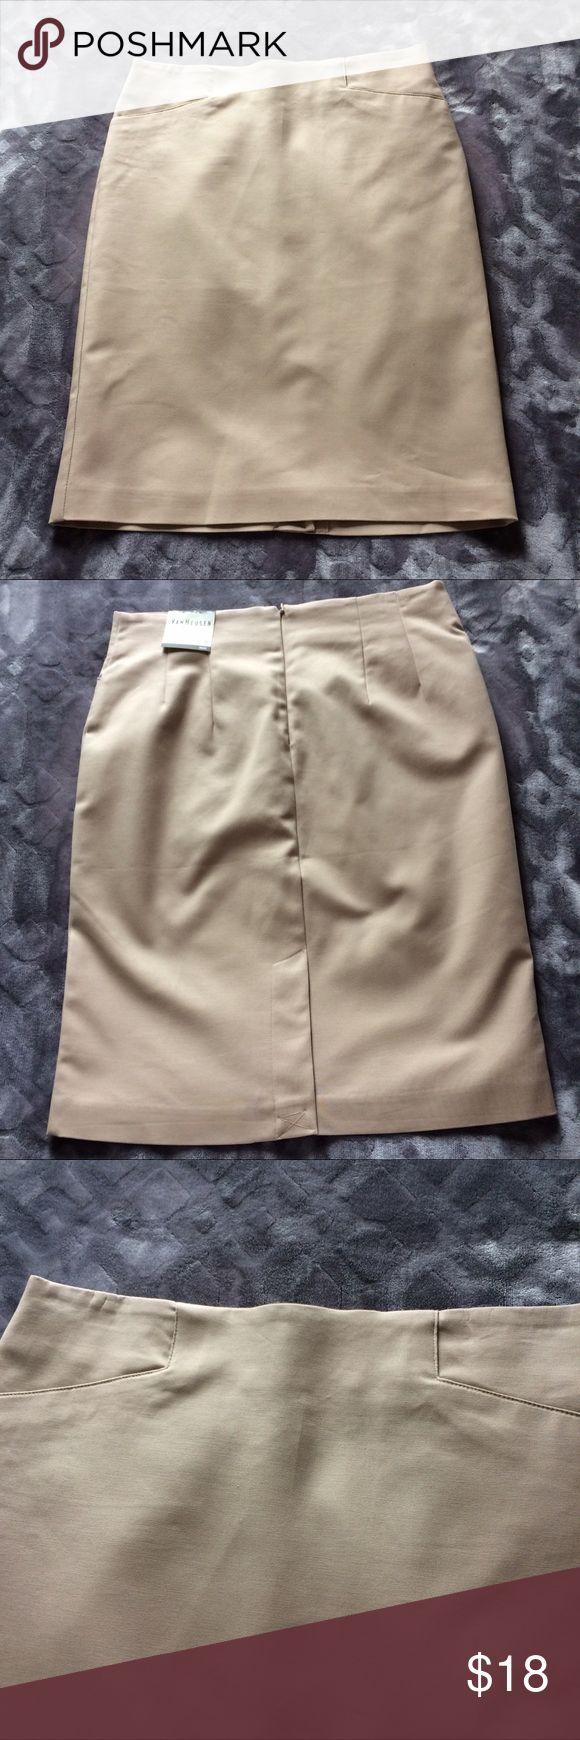 Women's khaki pencil skirt Classic khaki pencil skirt. NWT. VanHeusen Skirts Pencil